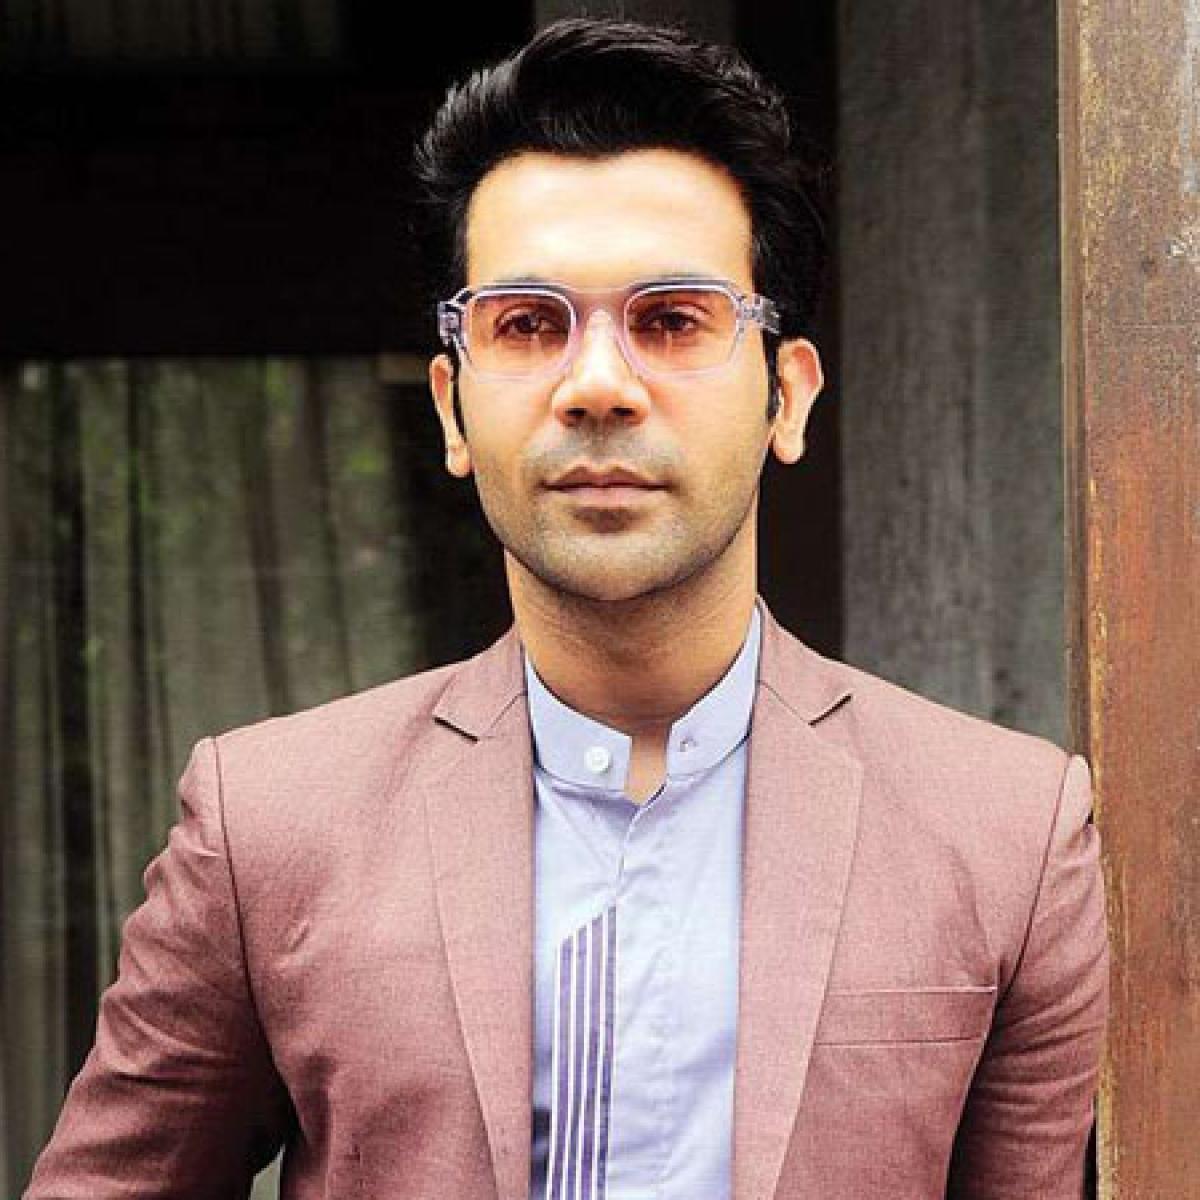 After 'Jabariya Jodi', Rajkummar Rao starrer 'Made In China' release postponed